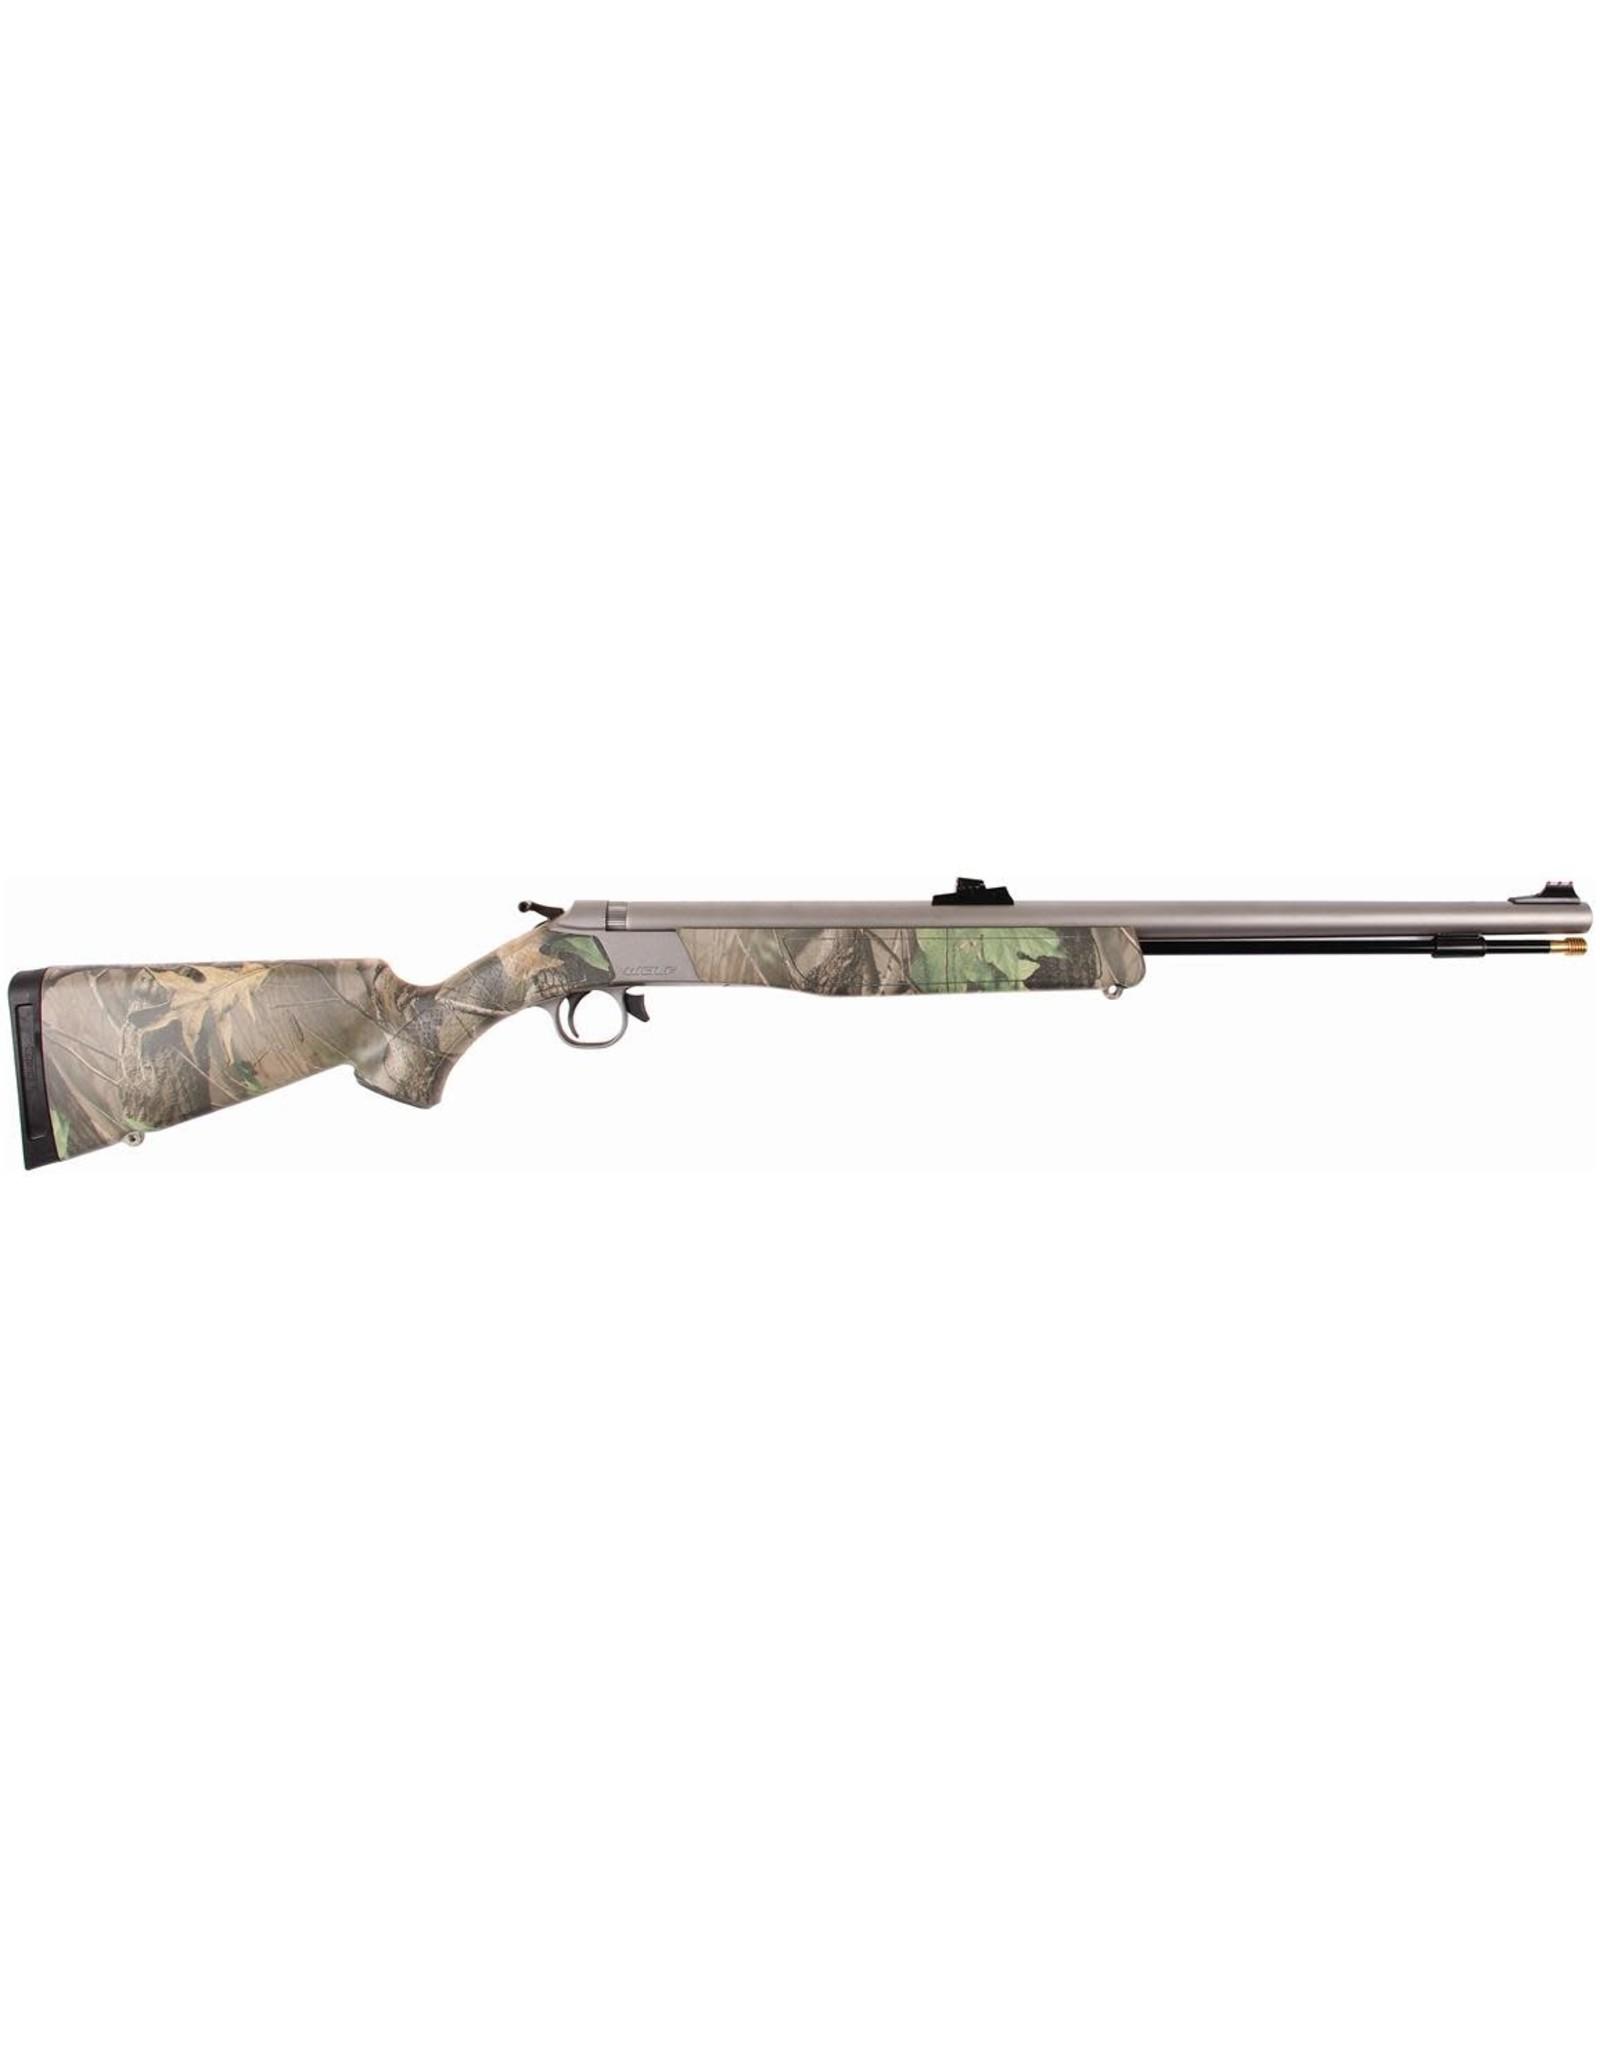 "CVA CVA Wolf .50cal Muzzleloading Rifle Fiber Optic Sights 24"" SS Barrel PR2112S"